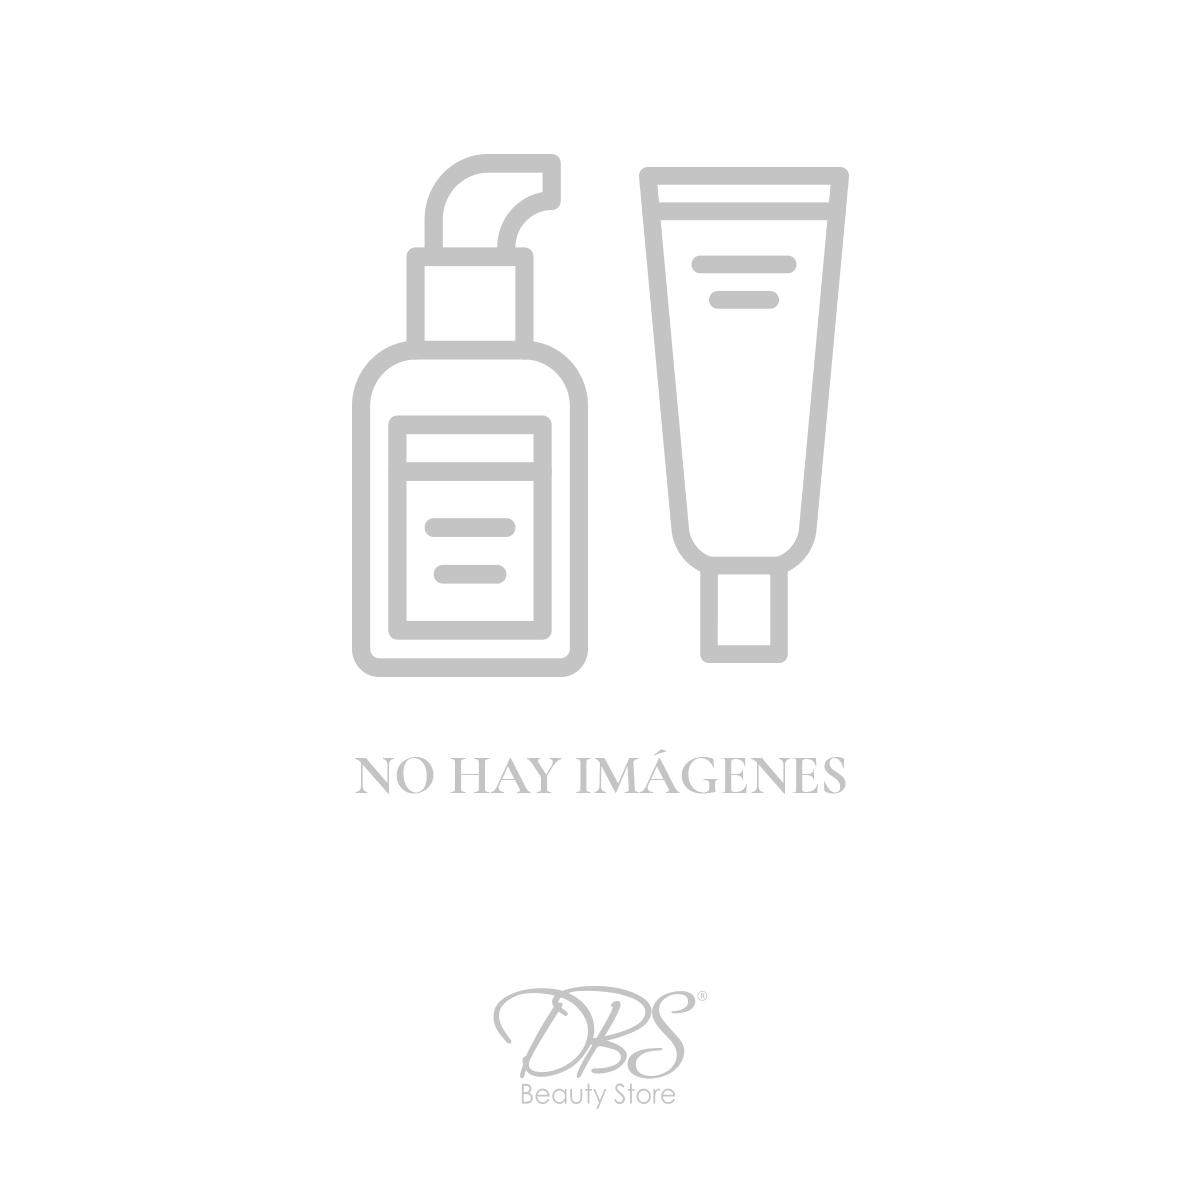 Shampoo Suave Perfecto 1000 Ml